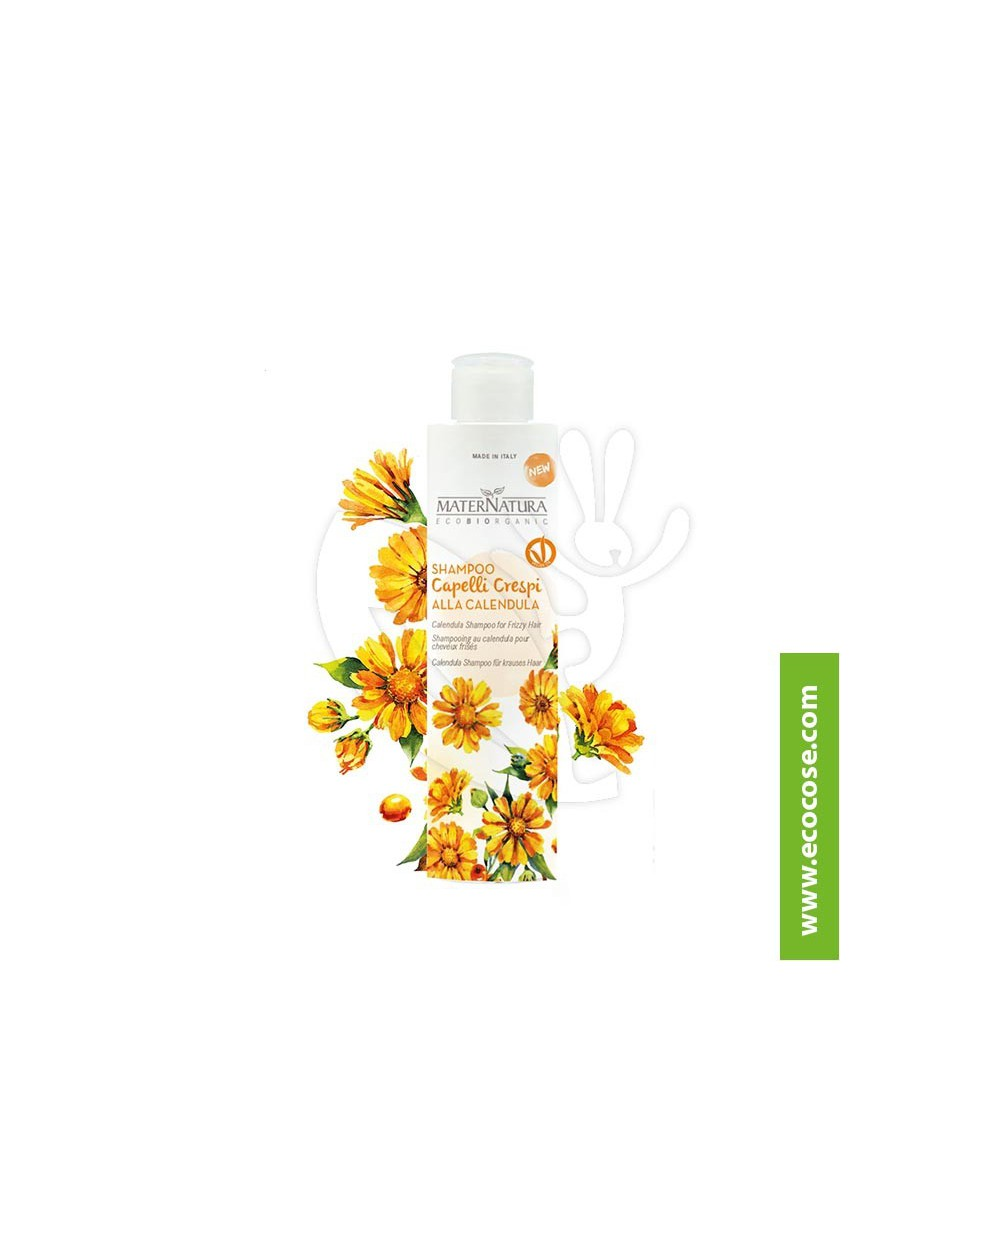 Maternatura - Shampoo Capelli Crespi alla Calendula